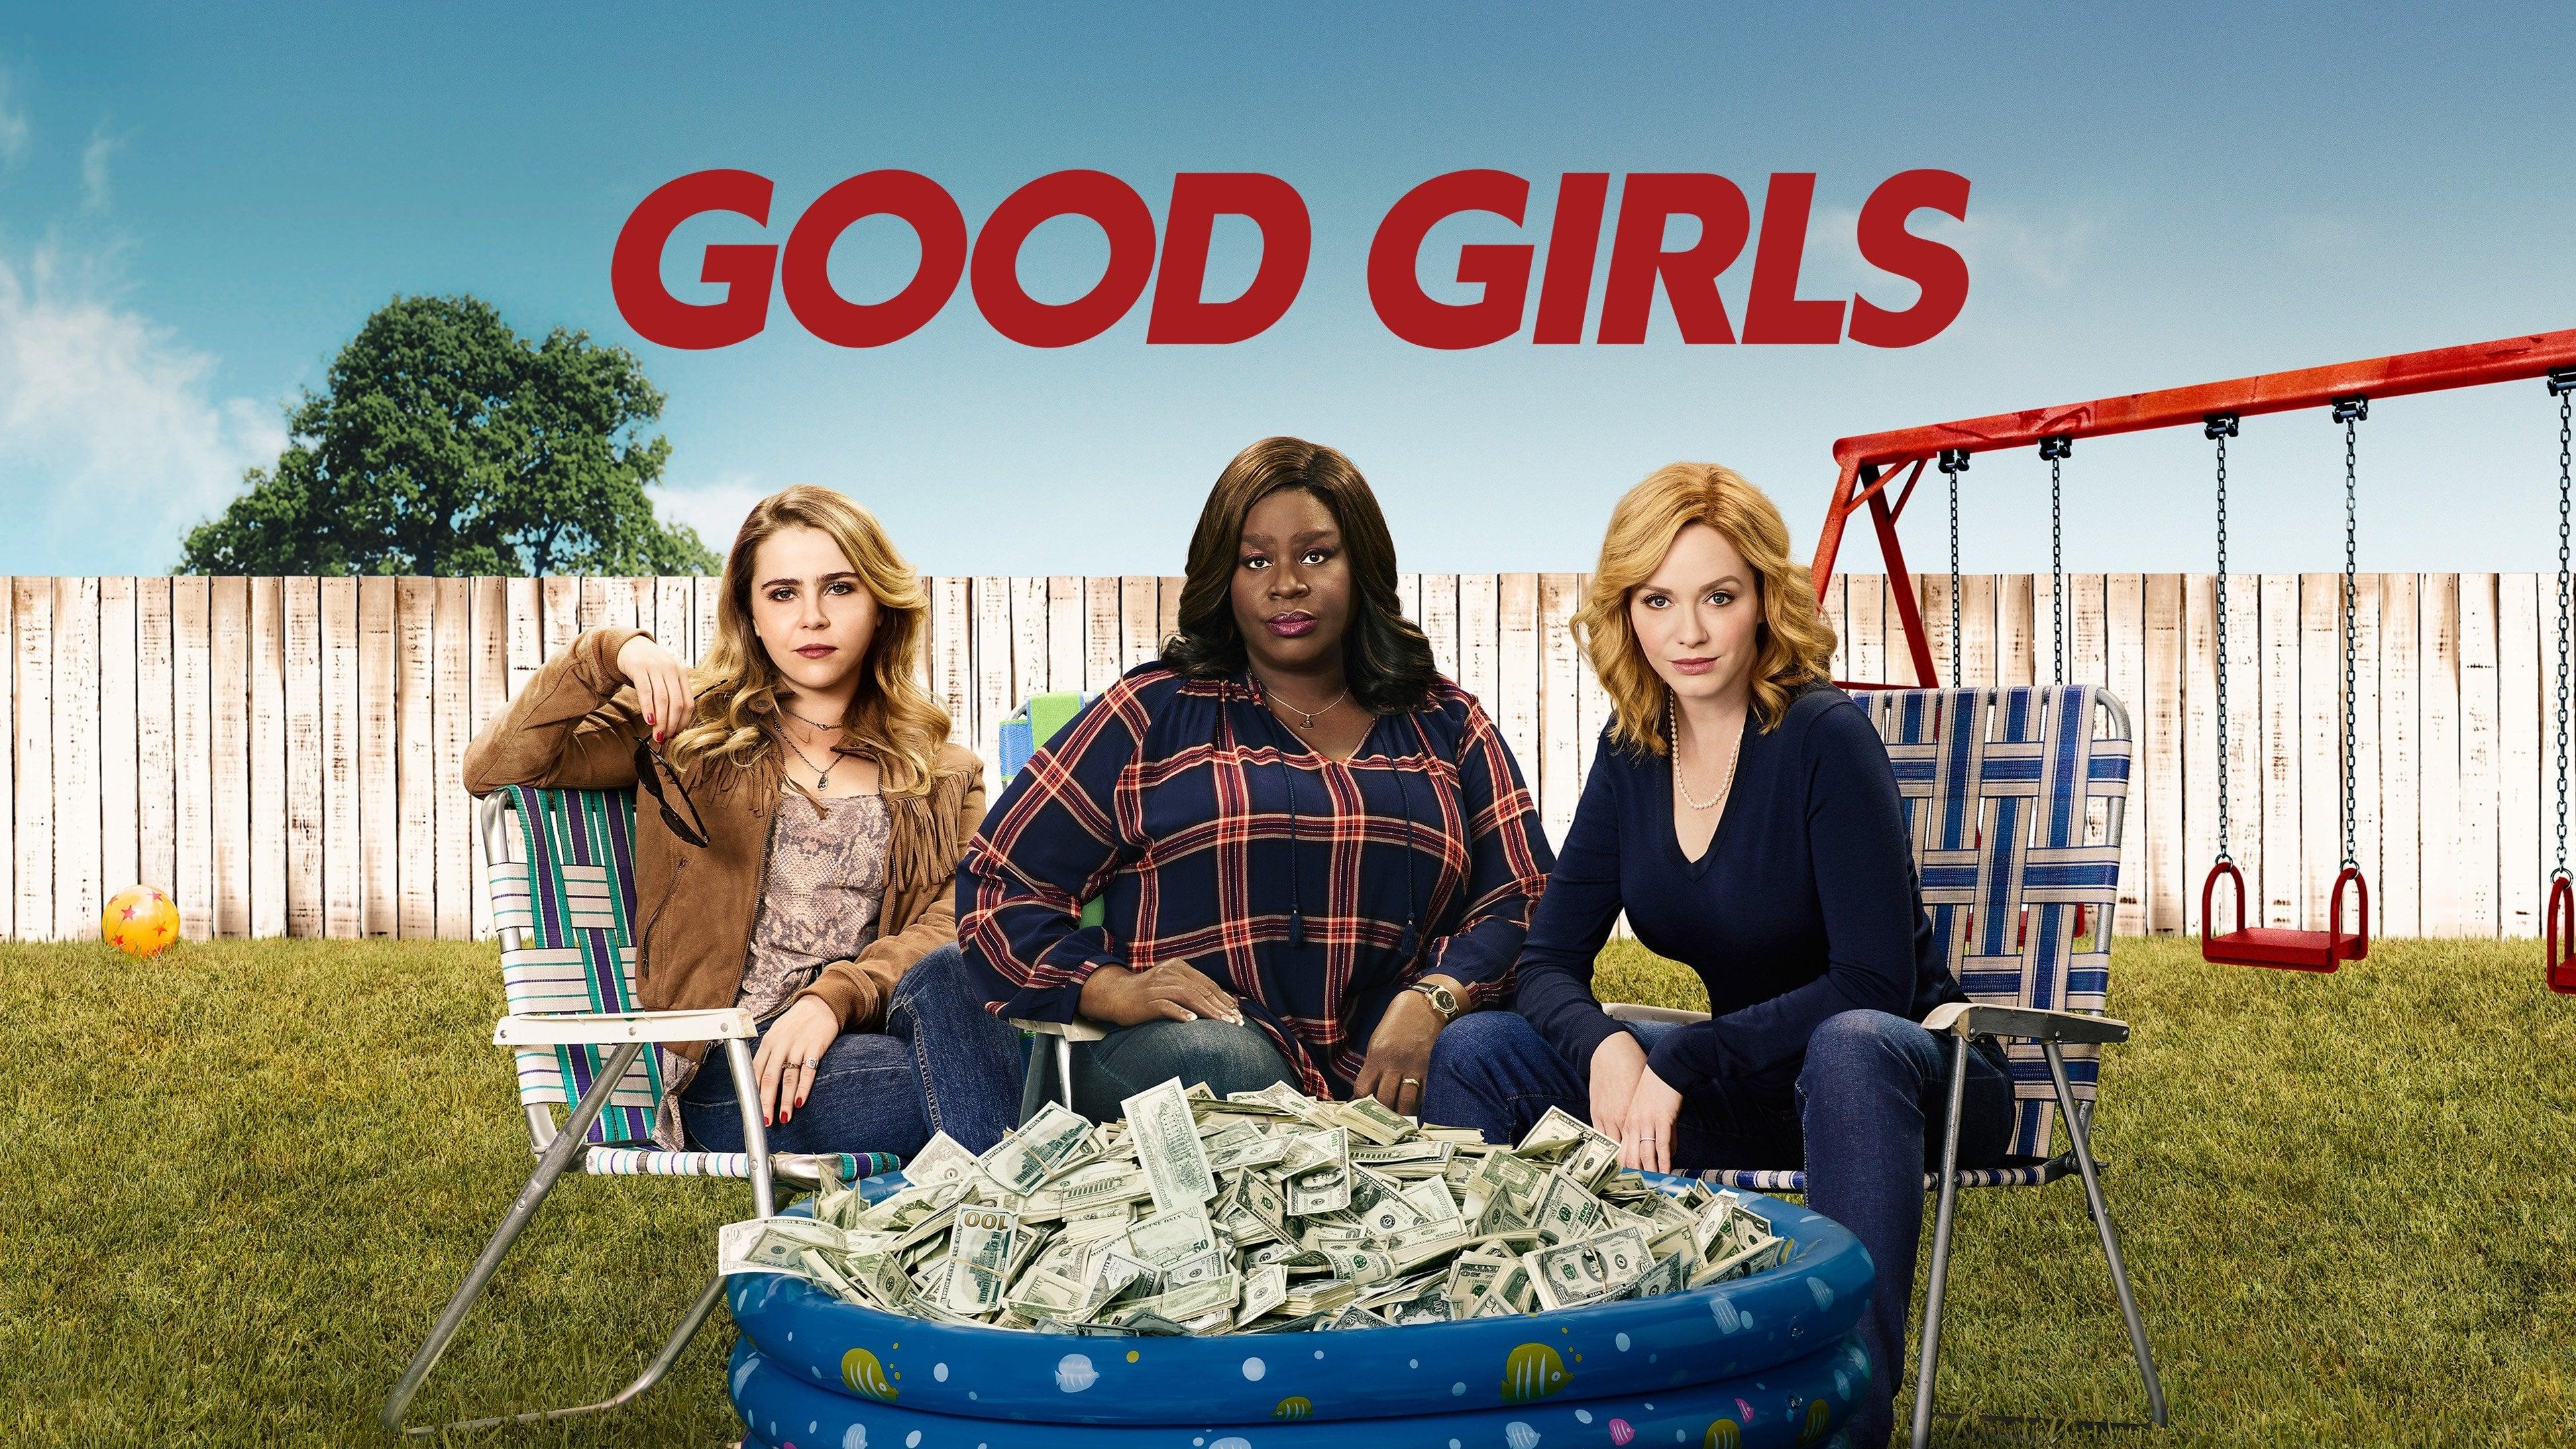 No fifth season for Good Girls